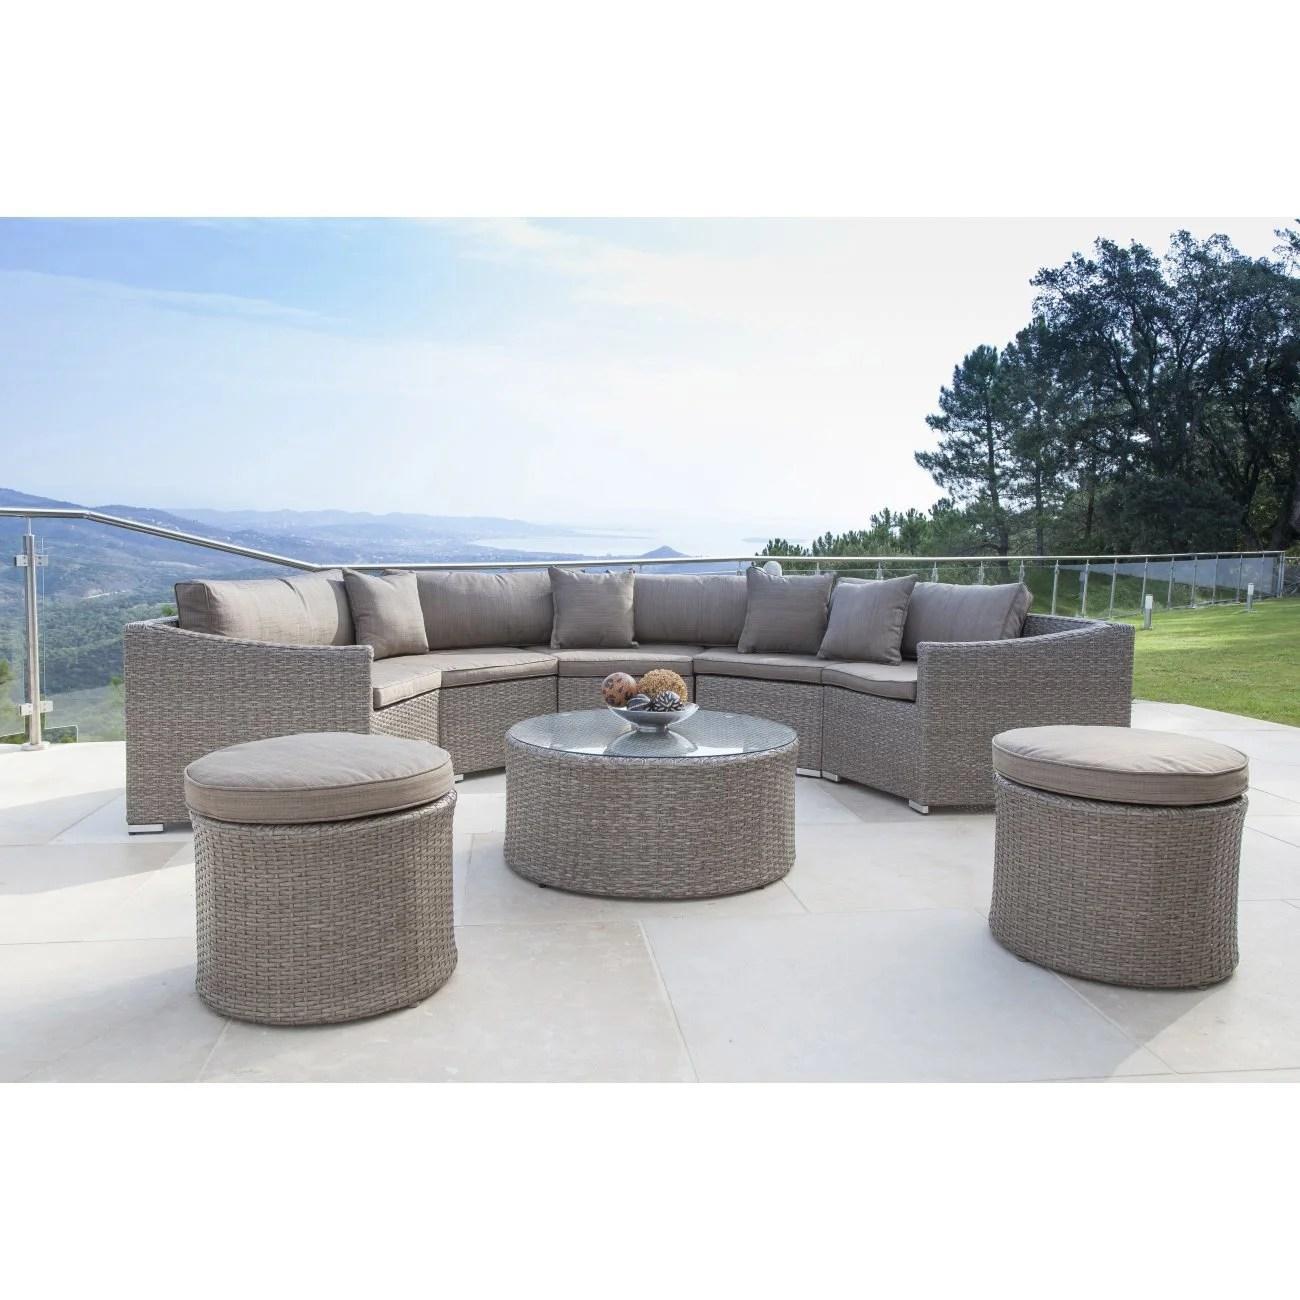 Best Salon De Jardin Gris Maloya Images - House Design - marcomilone.com